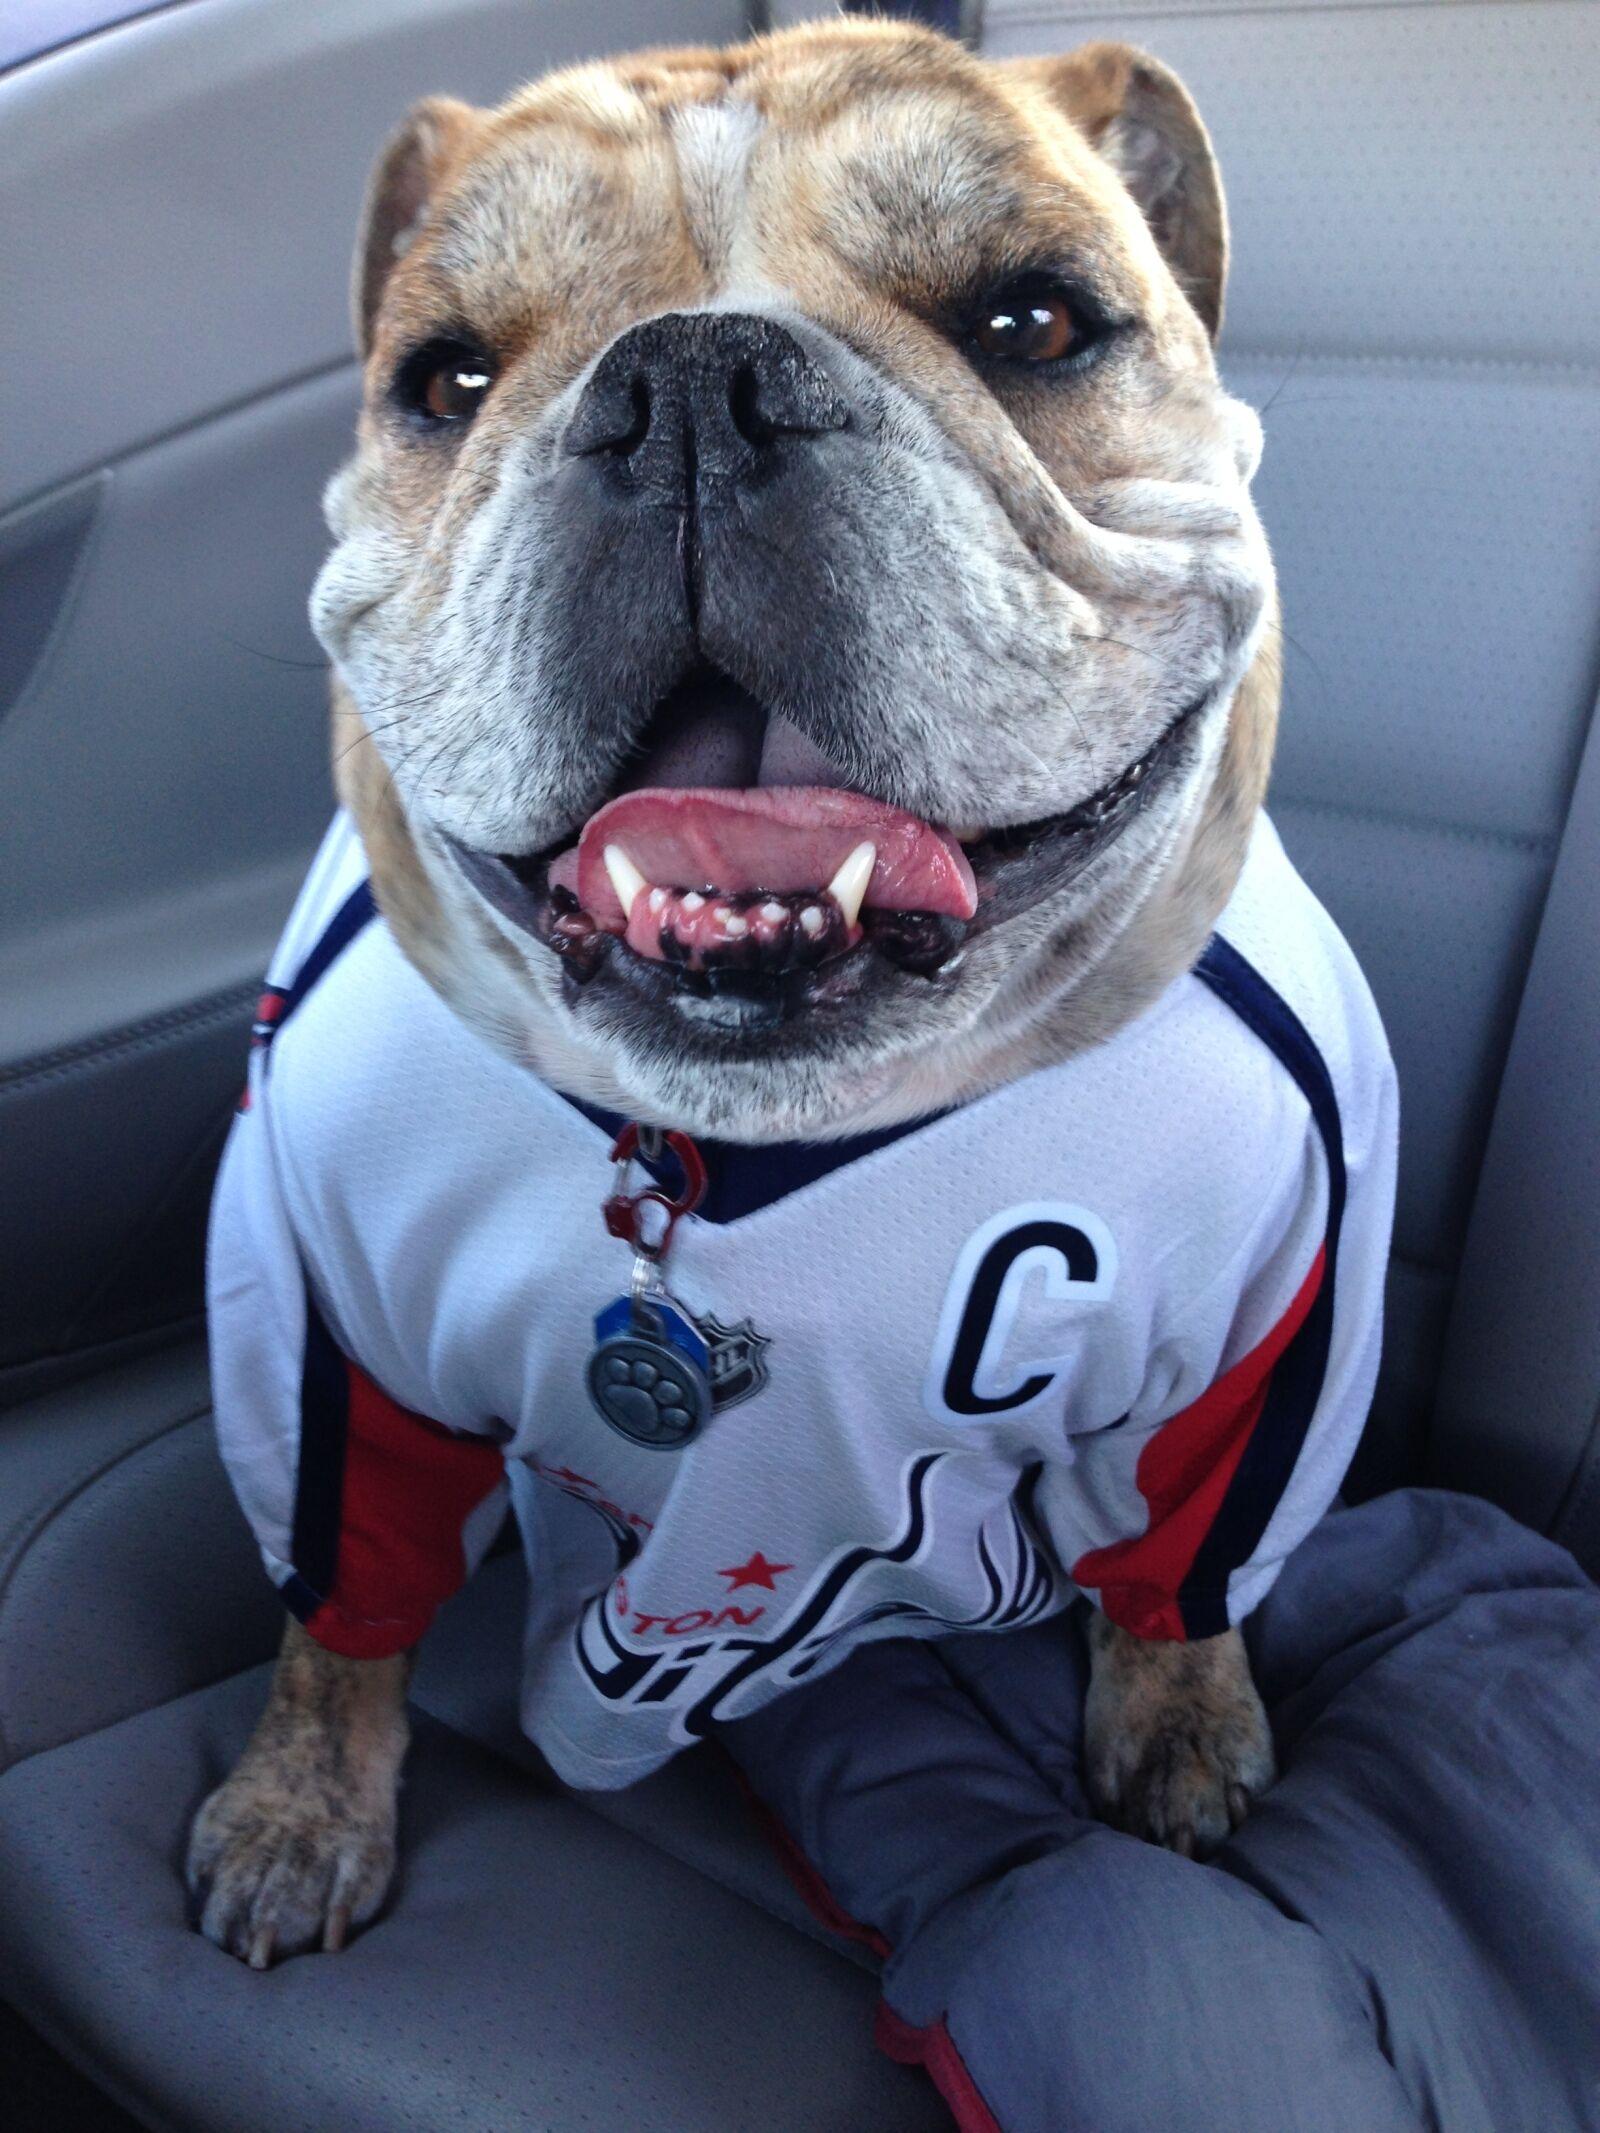 Ovie the Bulldog on hockey, friendship and snacks